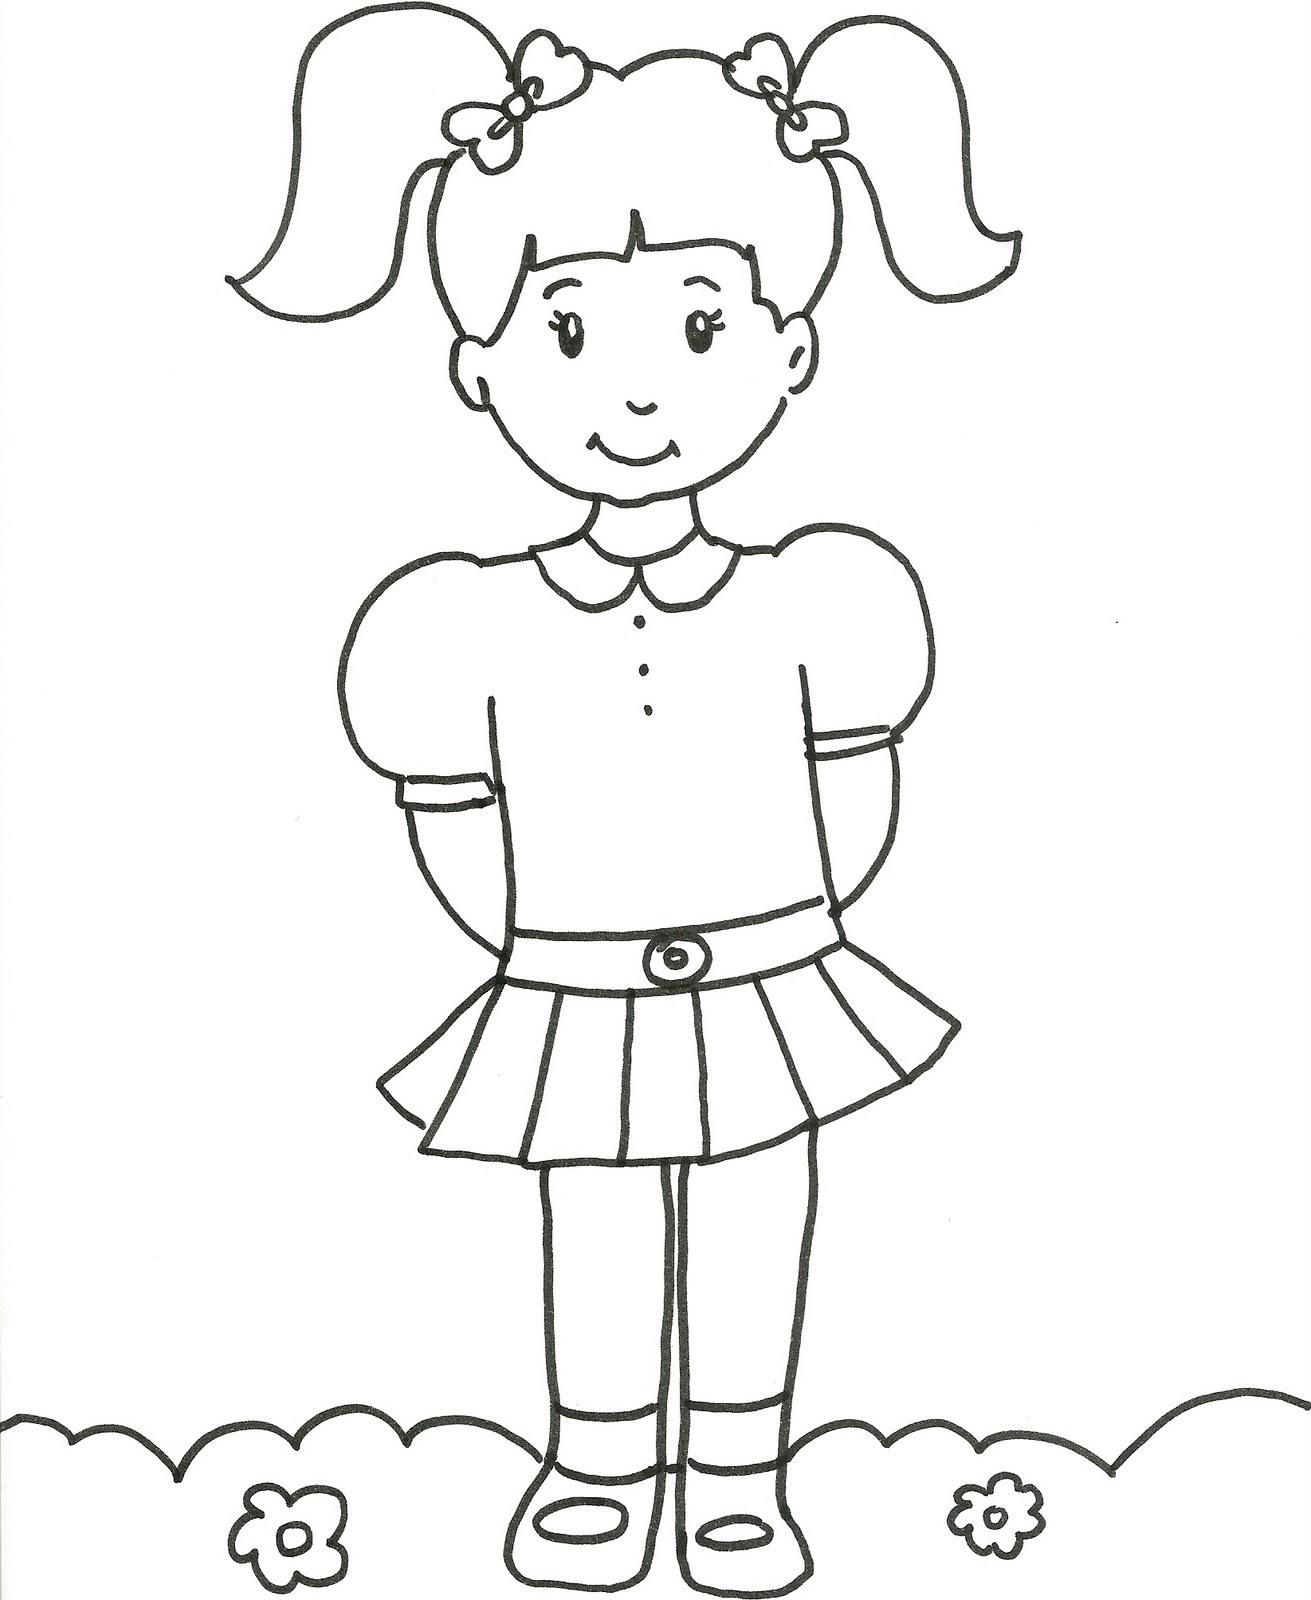 Desenhos Para Pintar Pintar Desenhos Para Meninas Colorir